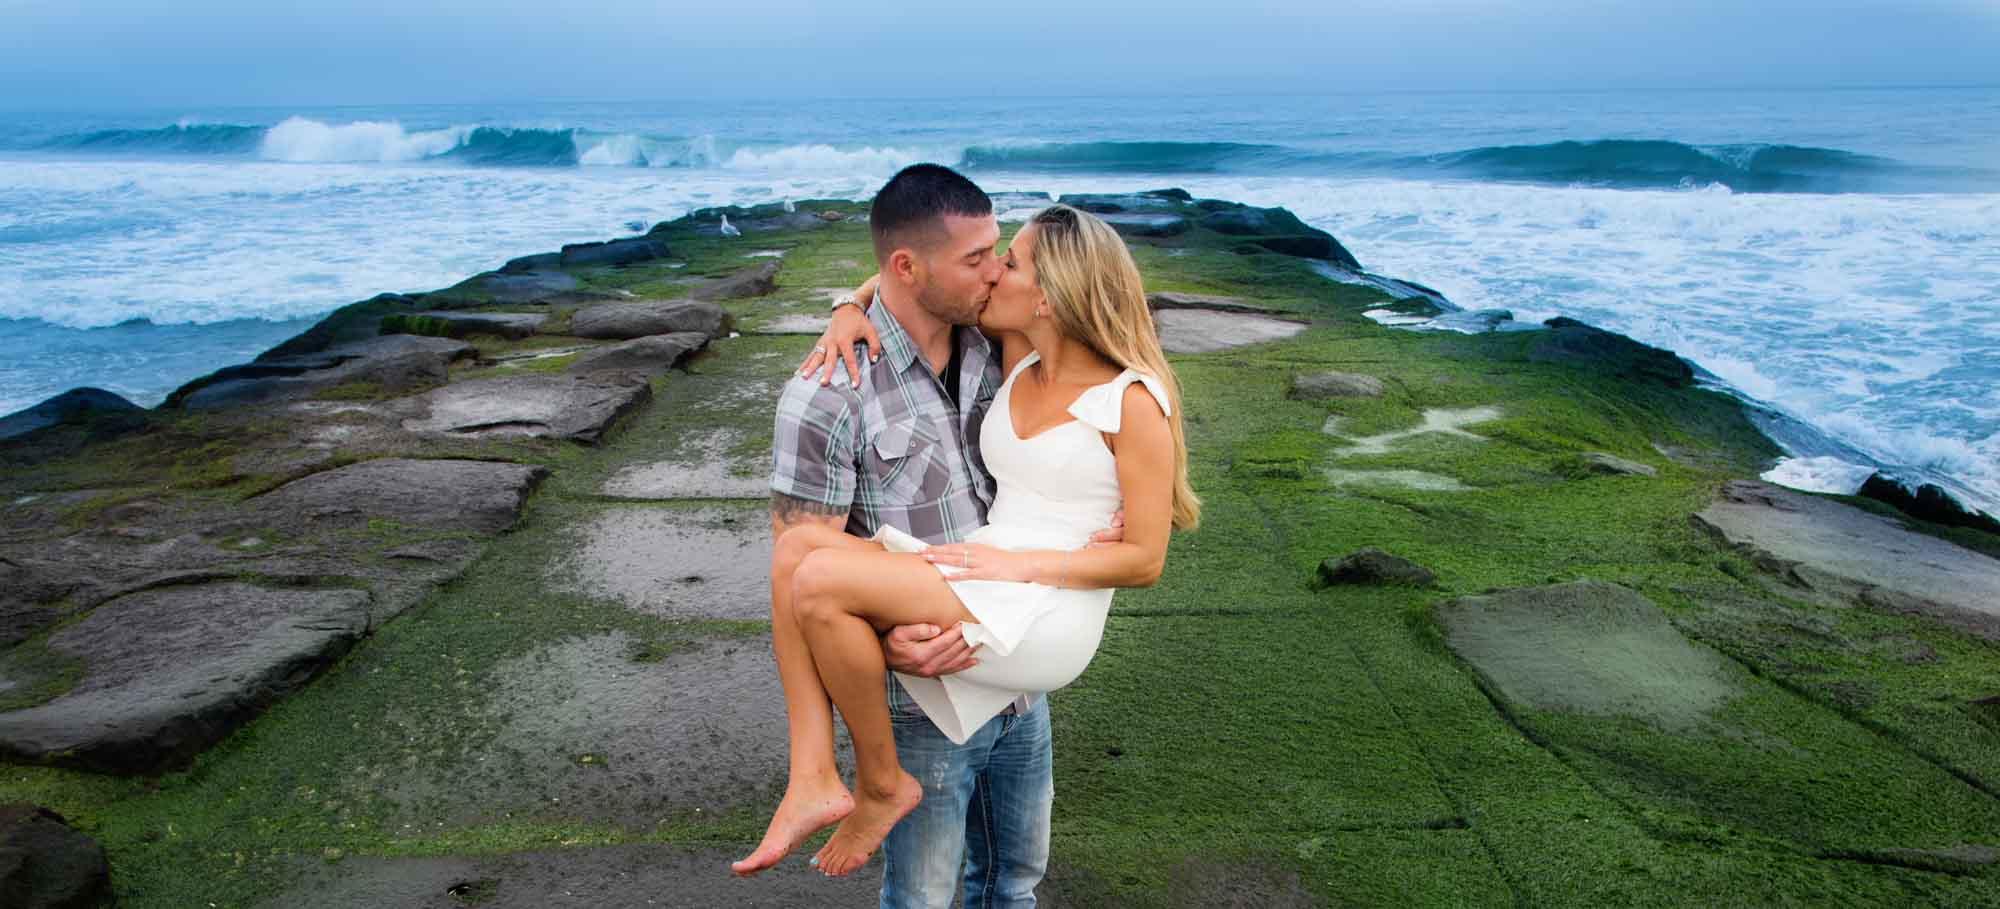 Weddings-Engagements-Jamie-Levine-Photography-New-York-NYC-9.jpg